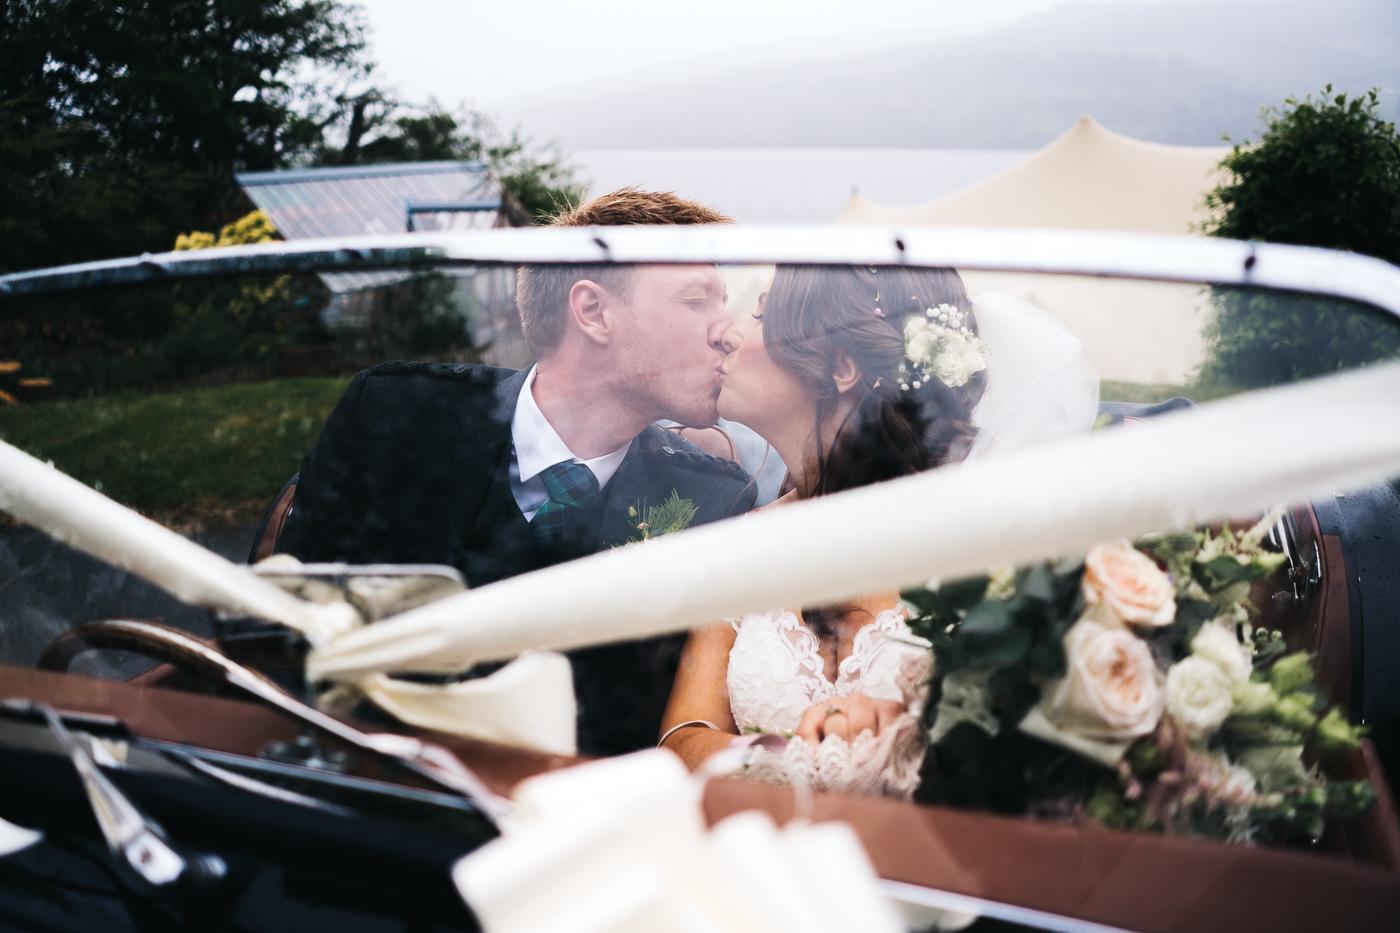 scottish-wedding-trossachs-loch-tay-highlannds-relaxed-photography-photographer-0026.jpg